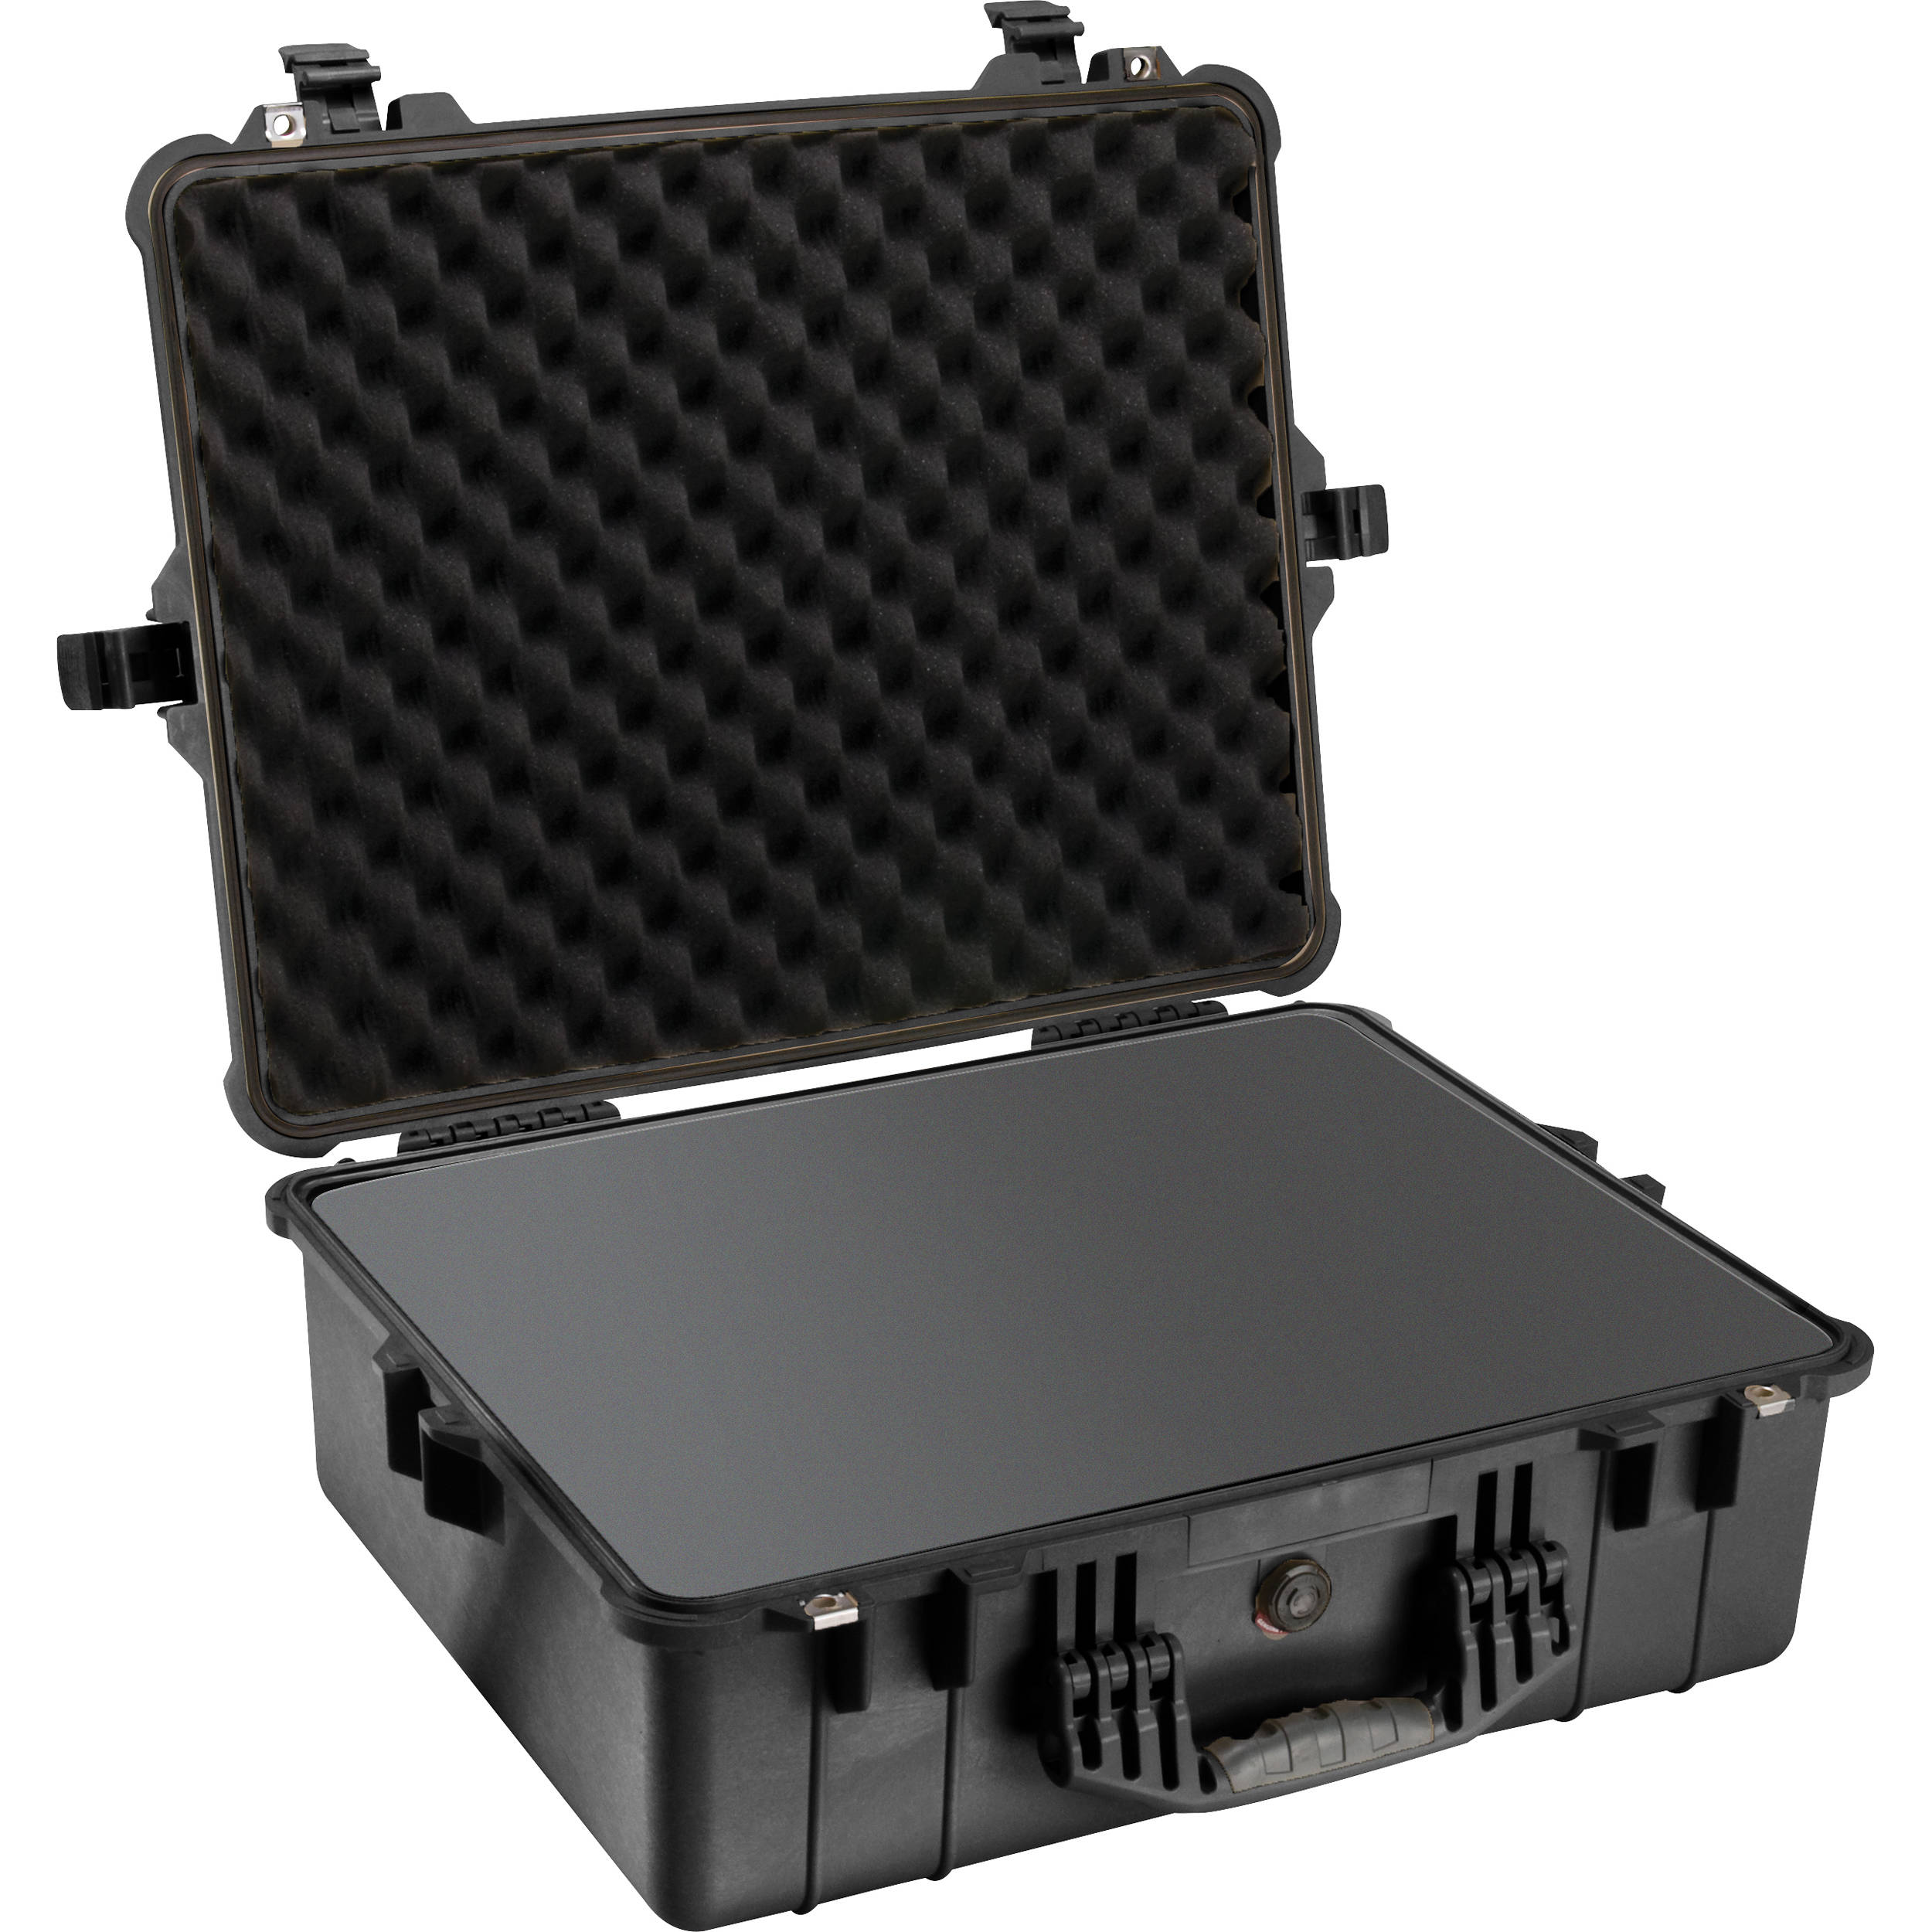 Pelican 1600 Case with Foam Set (Black) 1600-000-110 B&H Photo